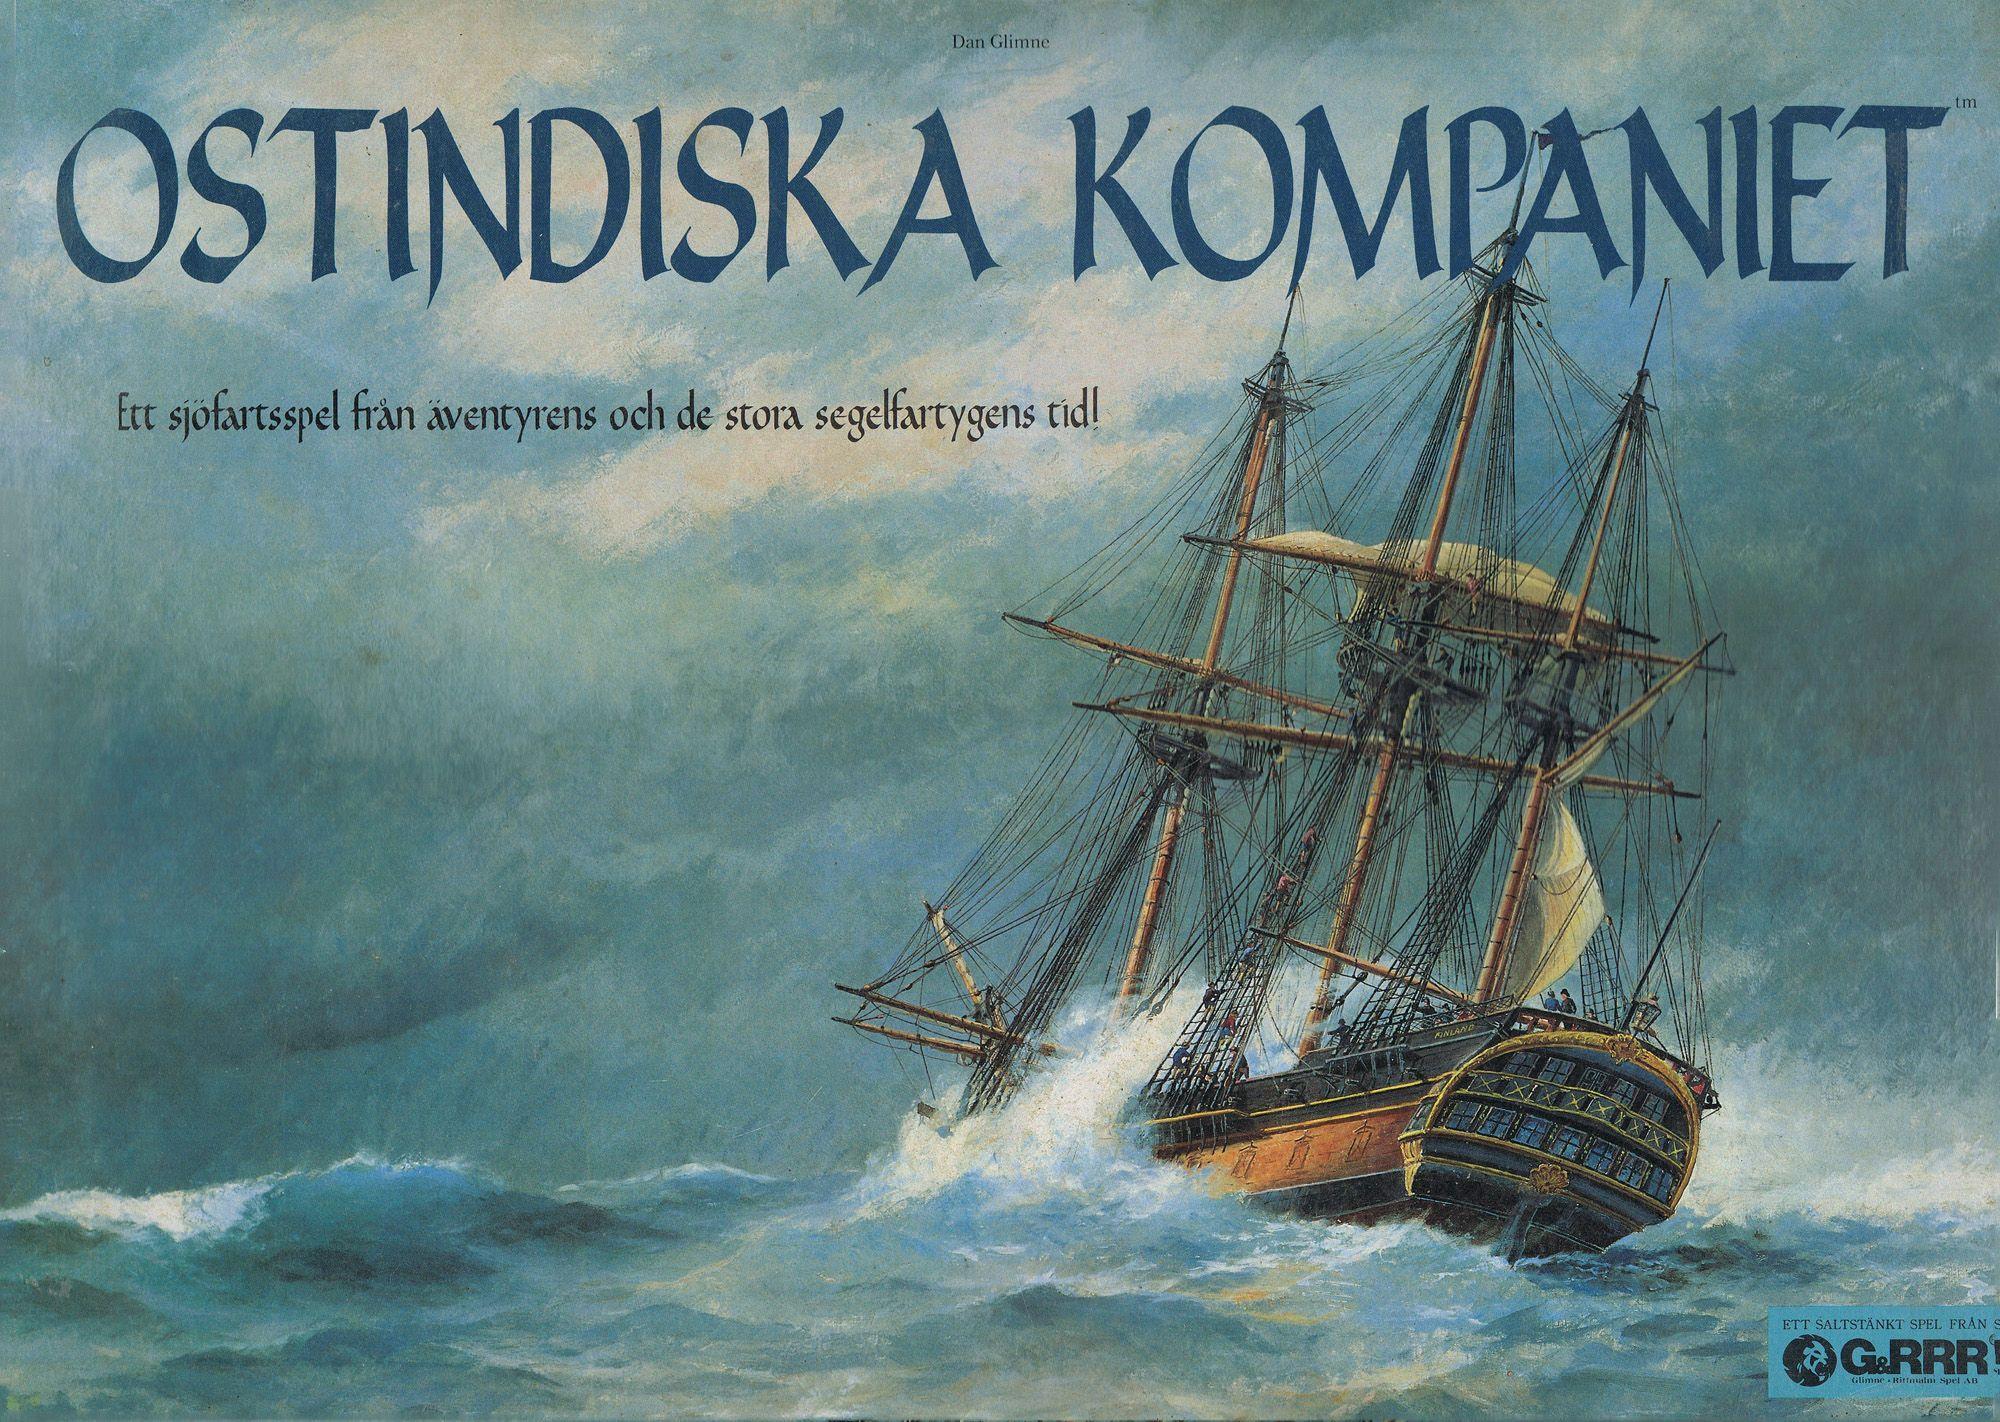 Ostindiska Kompaniet